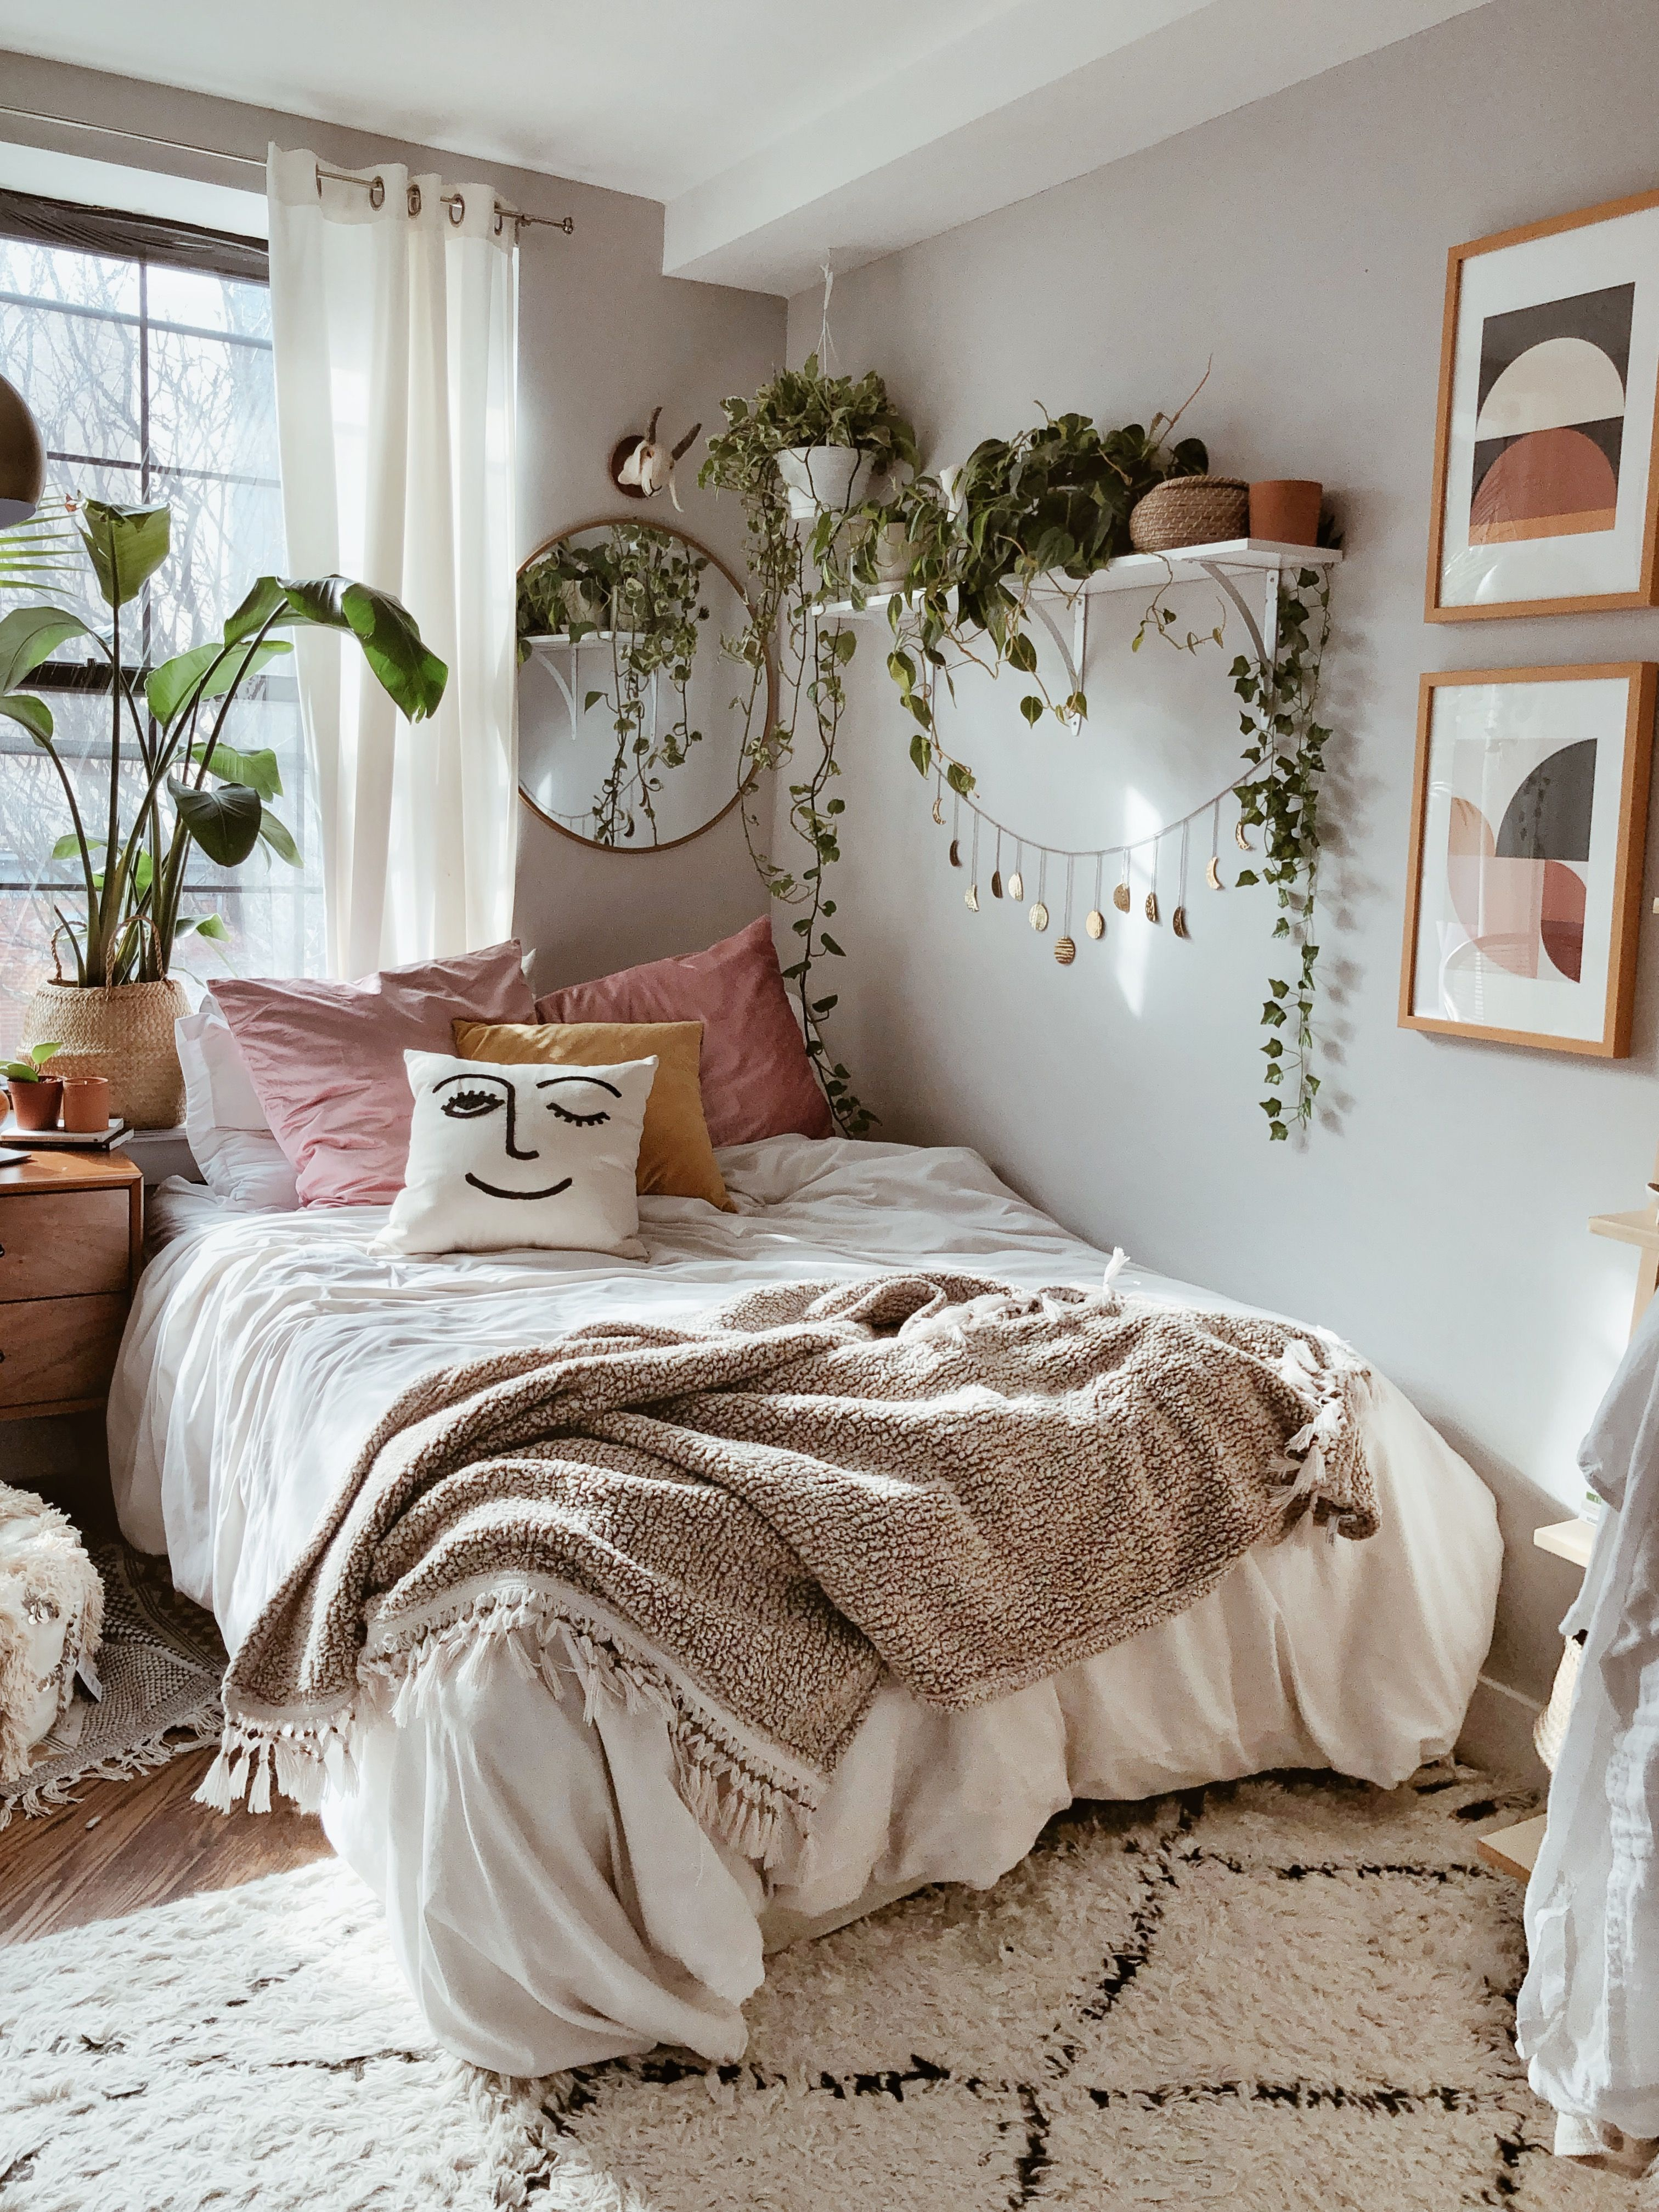 Boho Bedroom Aesthetic boho home decor boho bedroom DIY ... on Room Decor Aesthetic id=81886